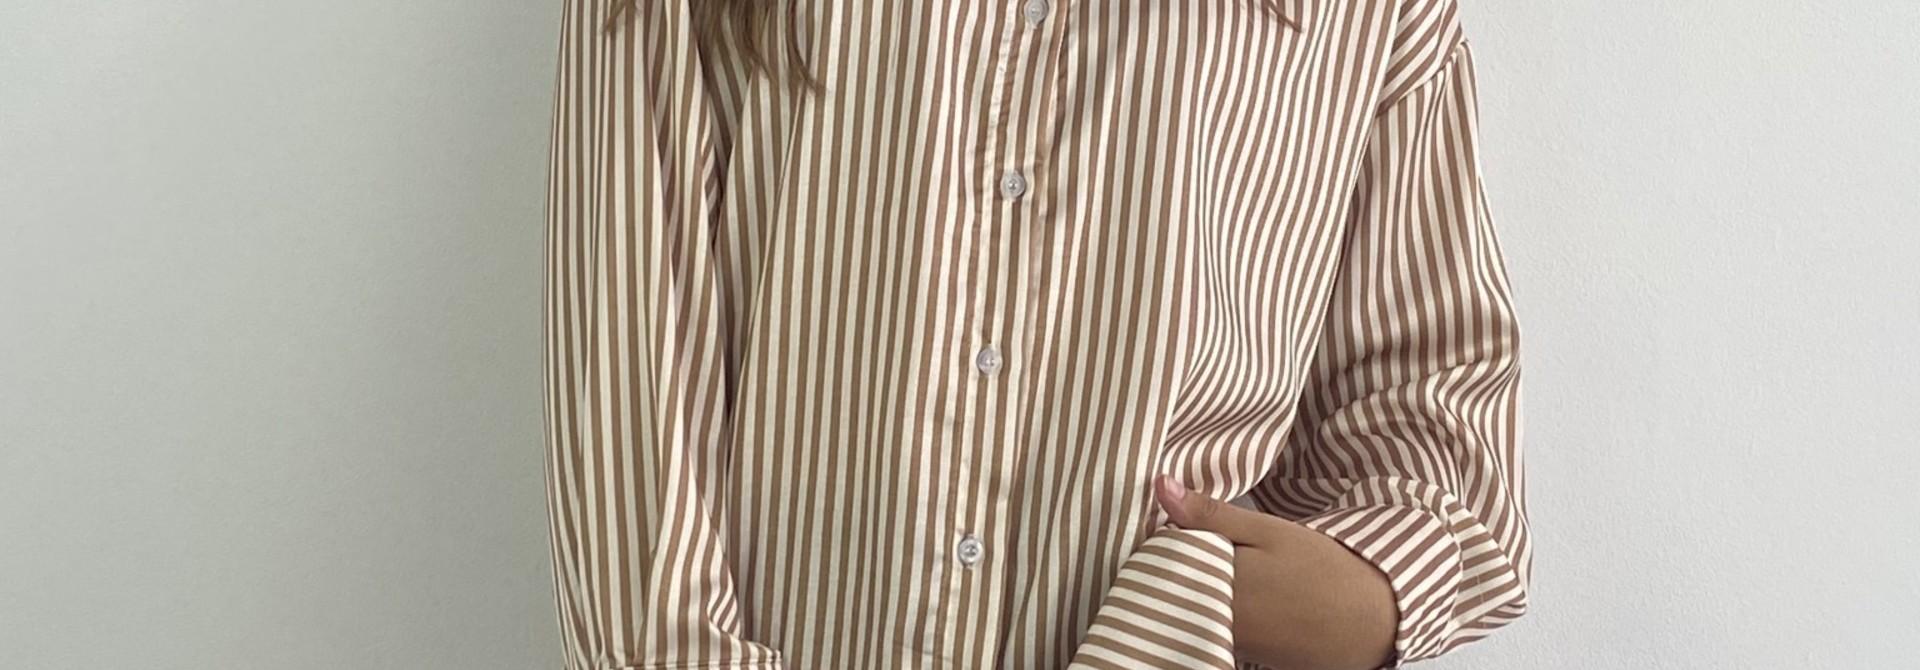 Ambrea stripped satin blouse Camel